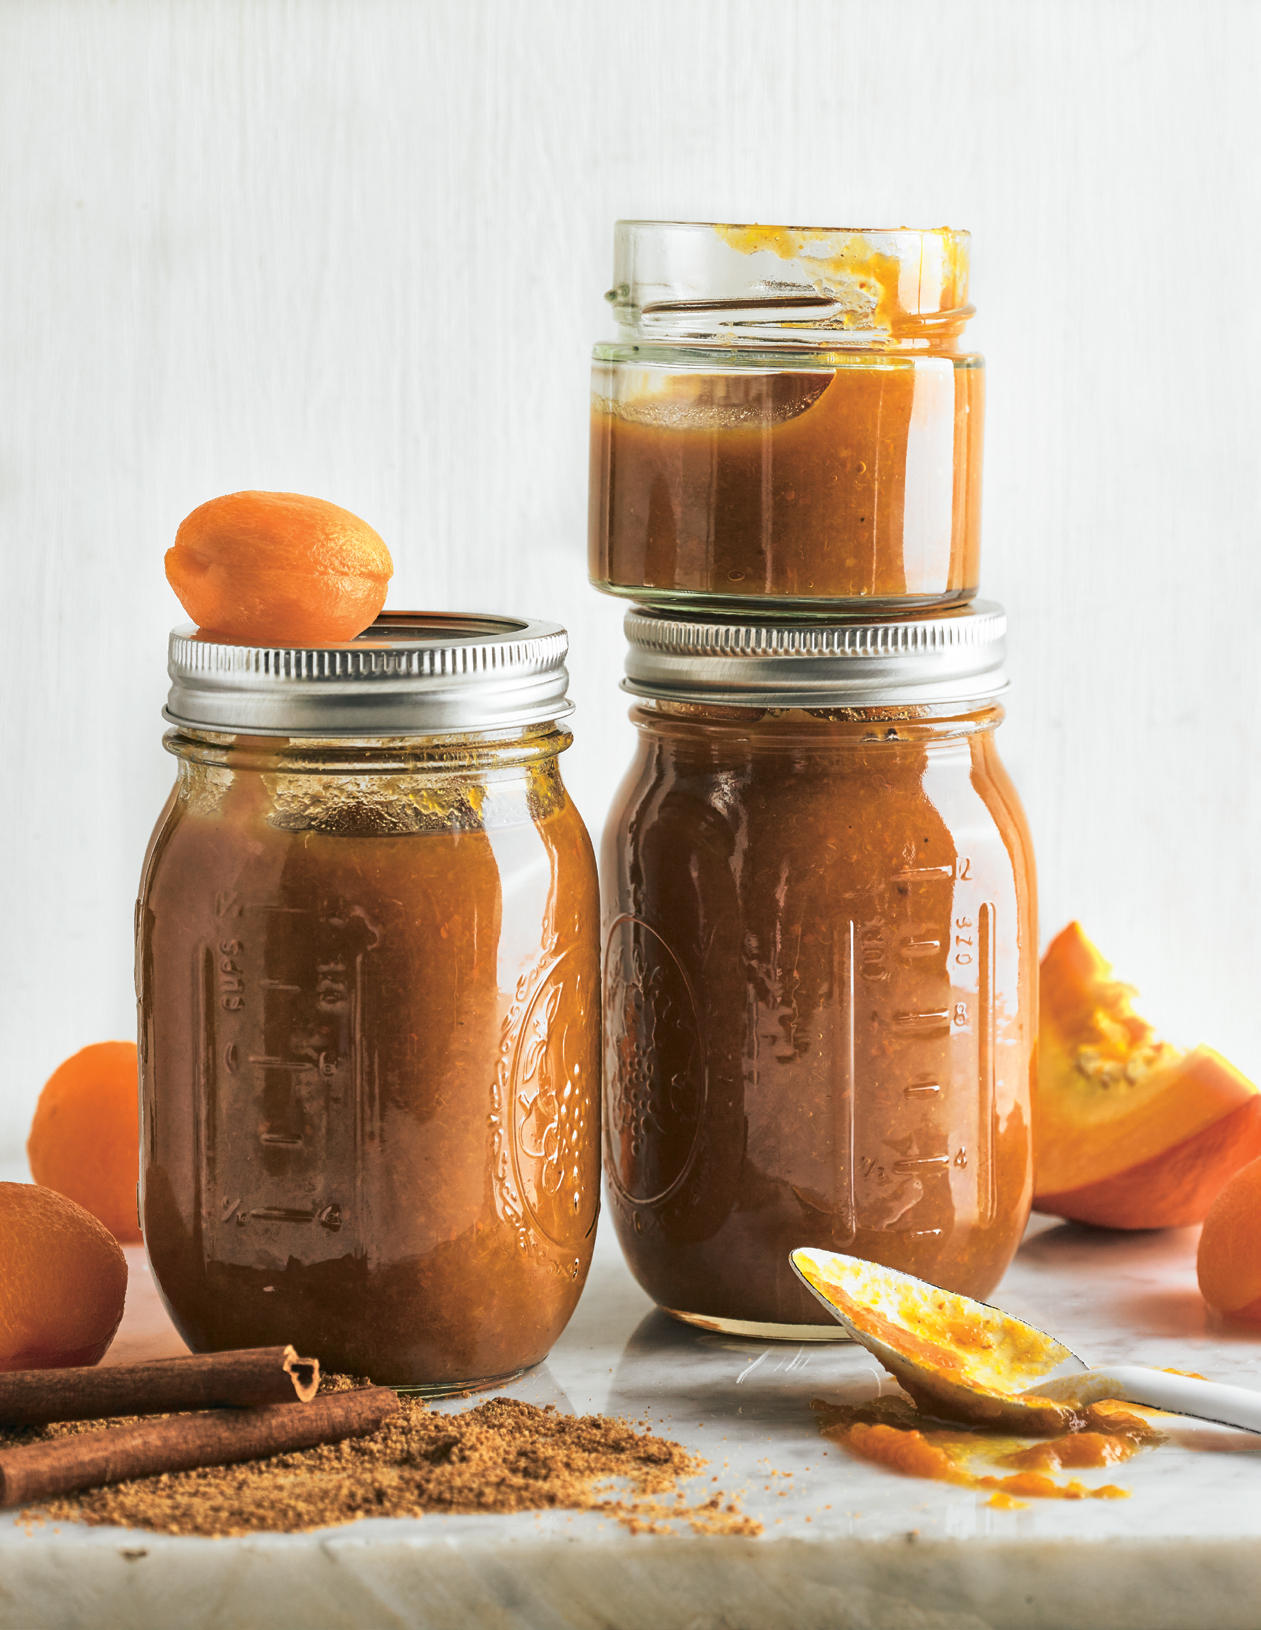 Aprikosenröster mit Kürbis und Zimt